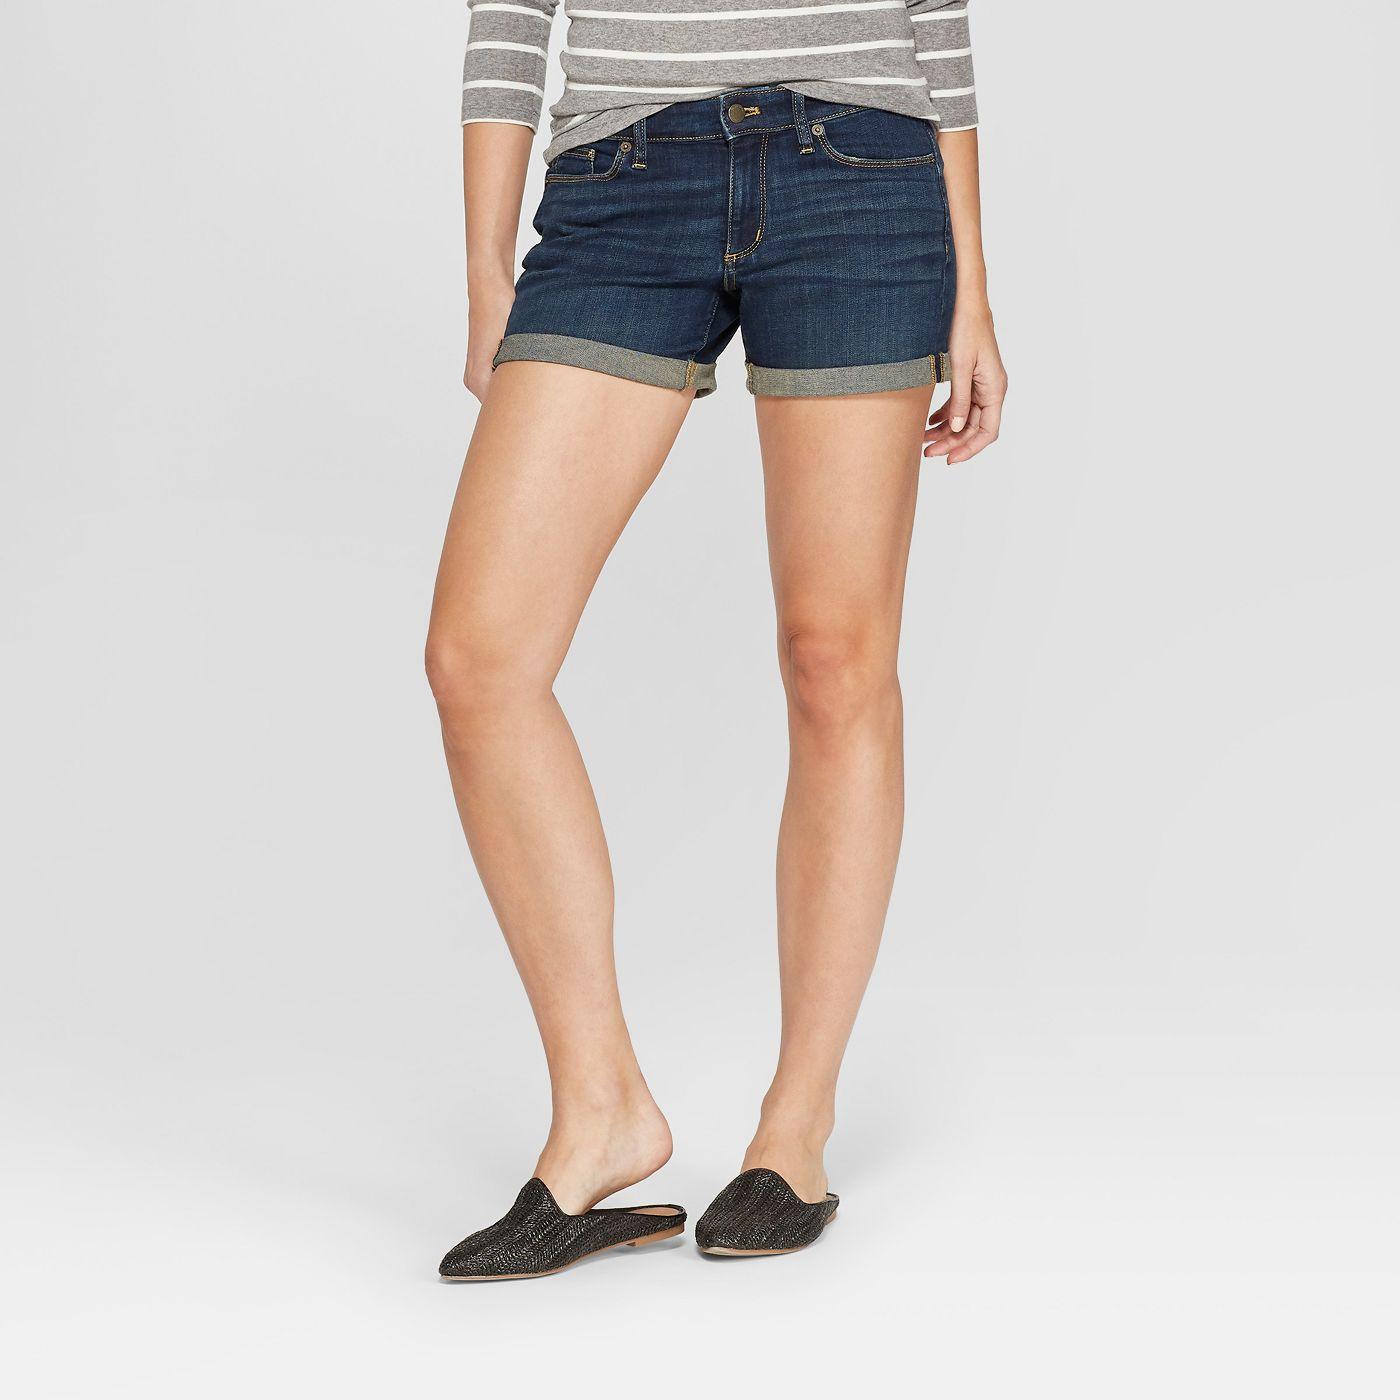 Women's Mid-Rise Rolled Cuff Midi Jean Shorts - Universal Thread™ Dark Wash - image 1 of 4